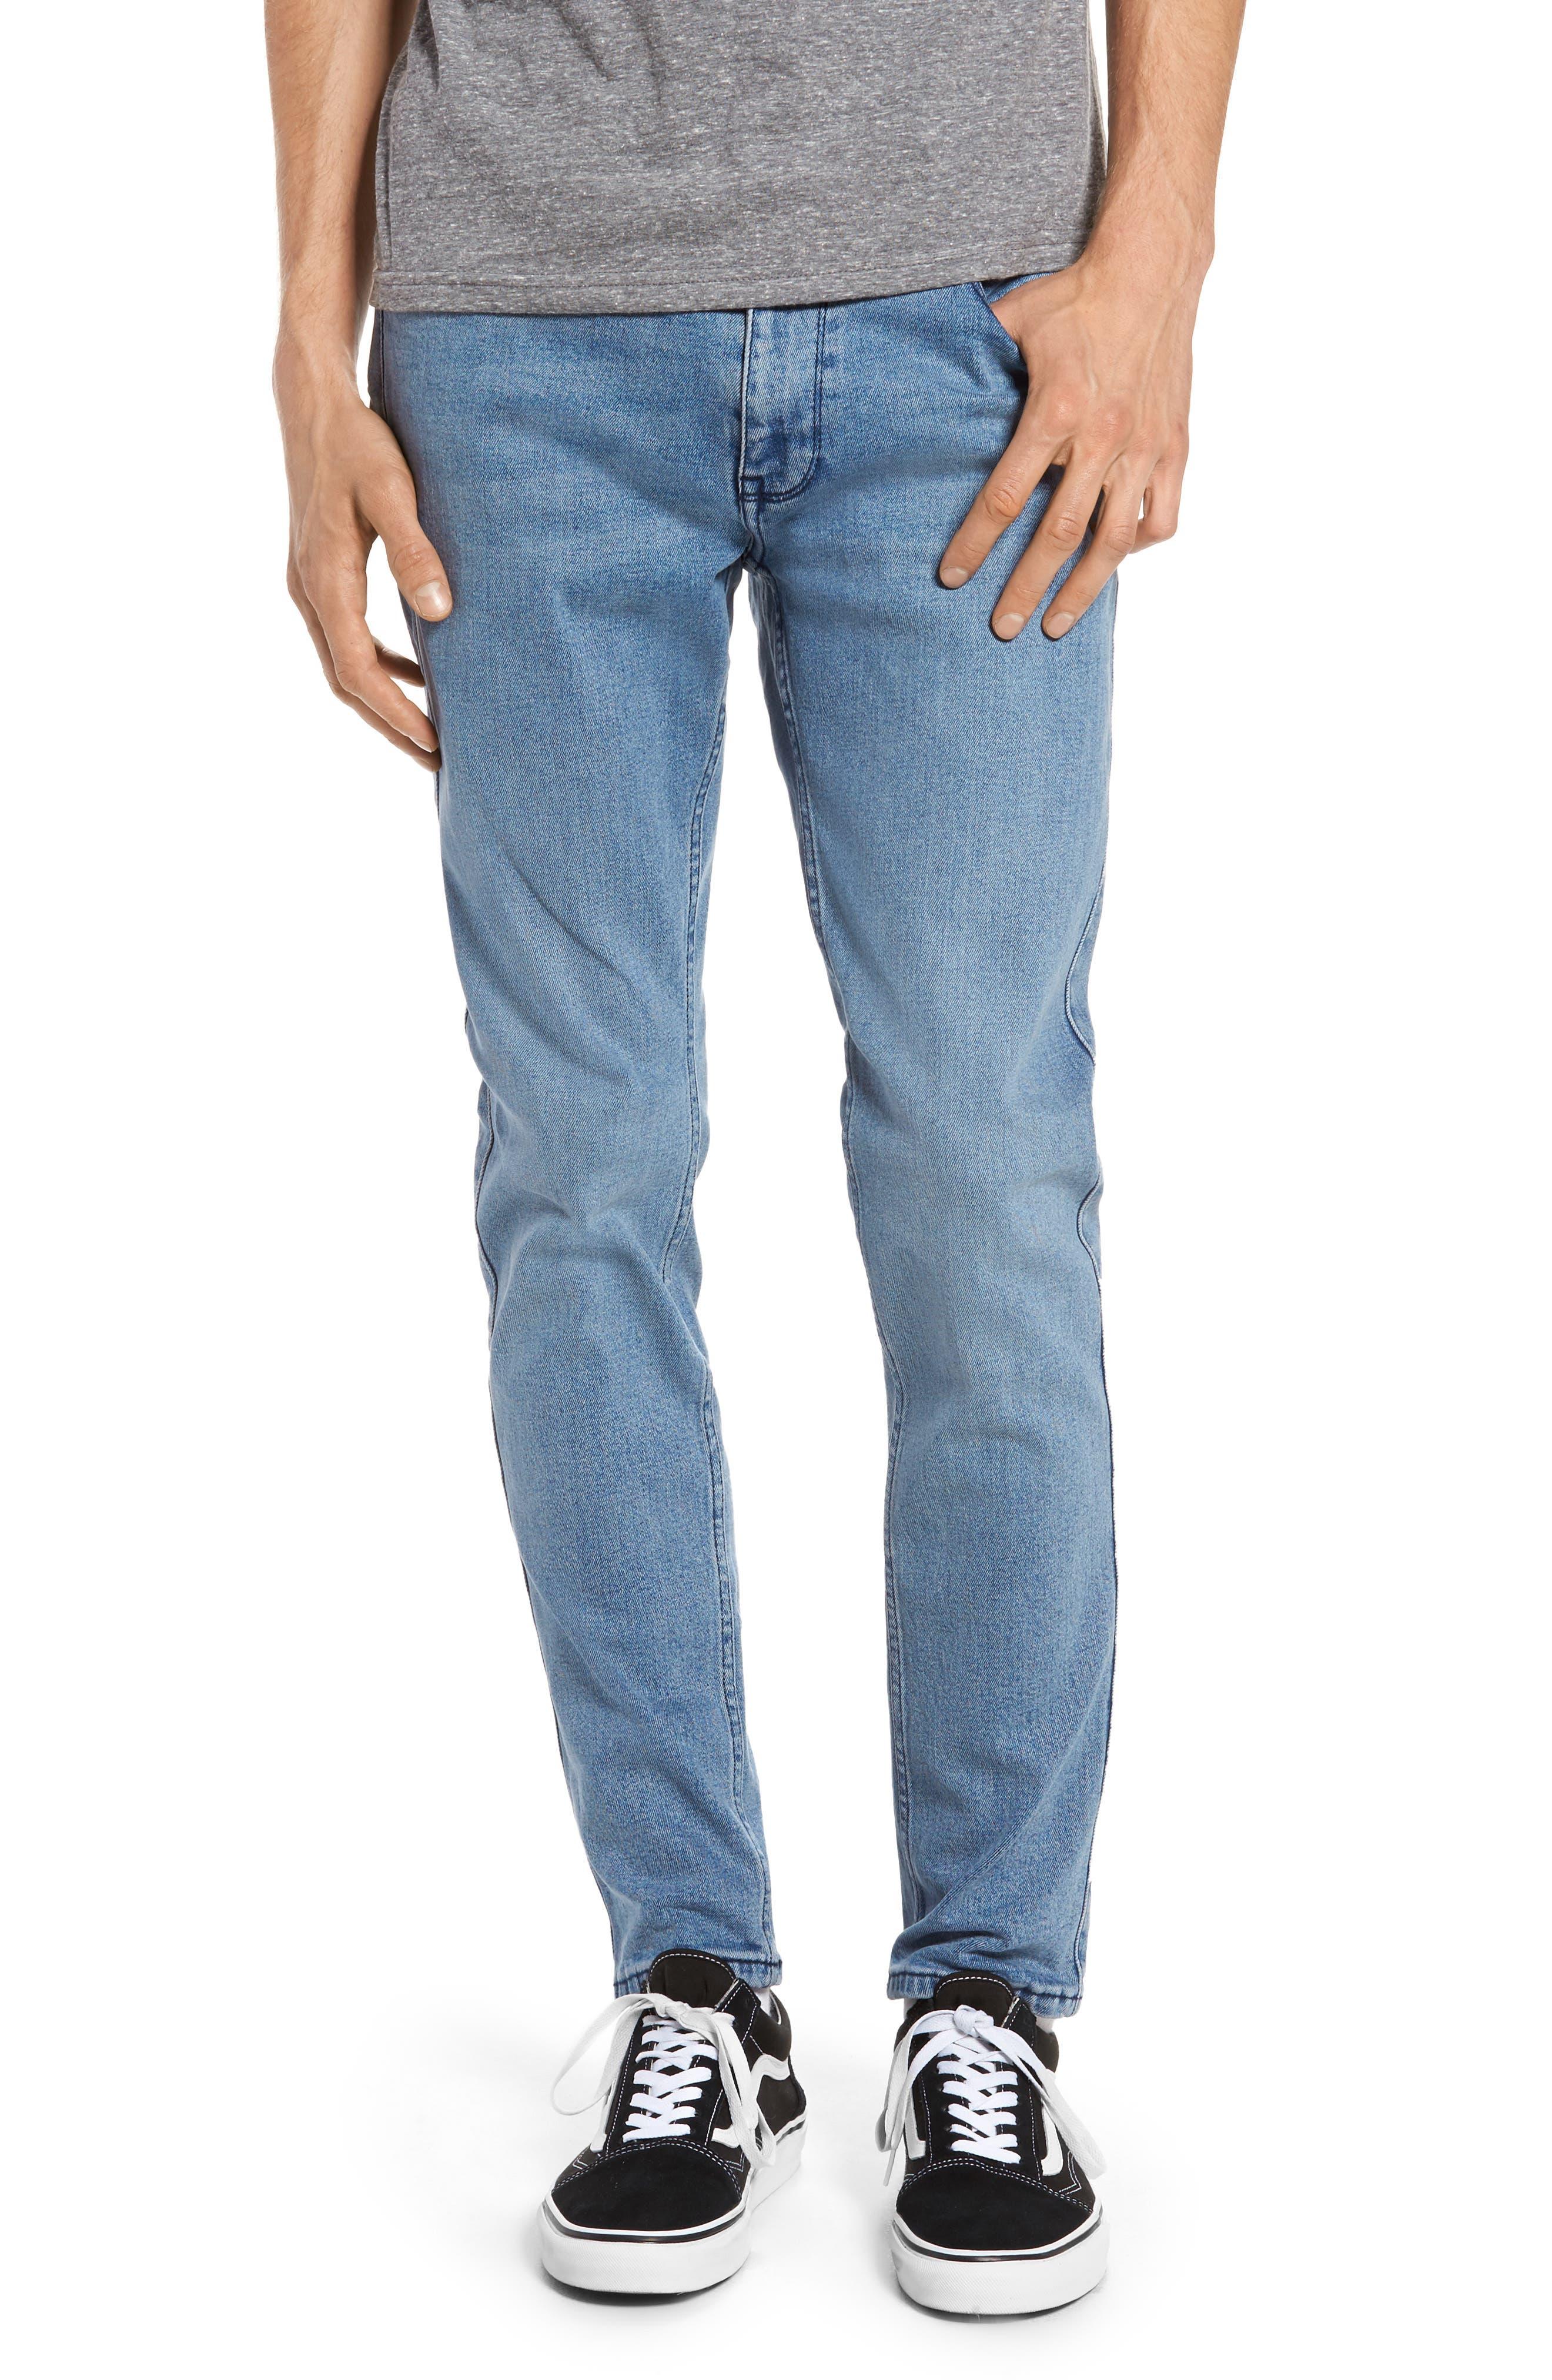 Dr. Denim Supply Co. Clark Slim Straight Leg Jeans (Worn Light Retro)